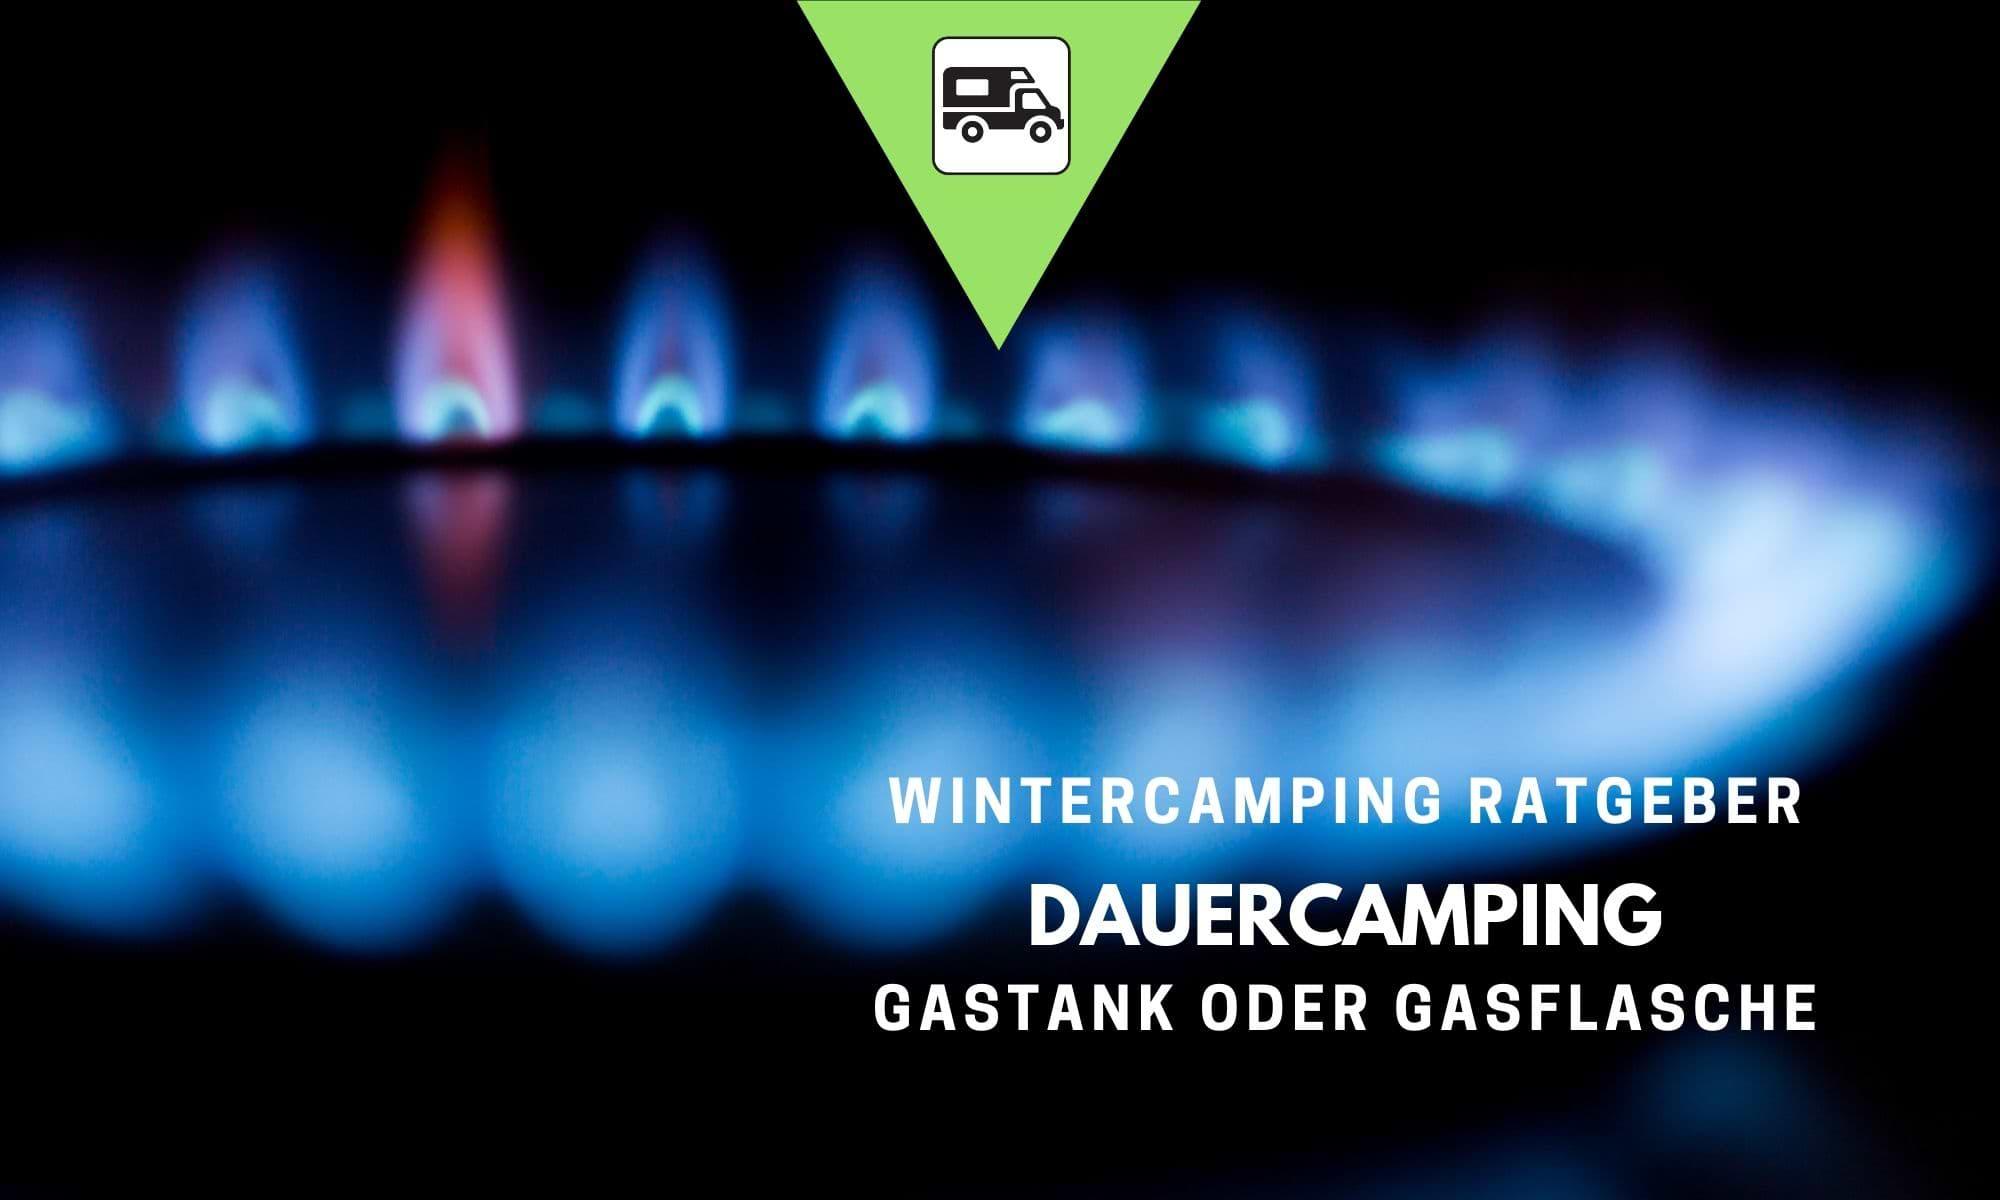 Wintercamping Ratgeber Gastank Dauercamping